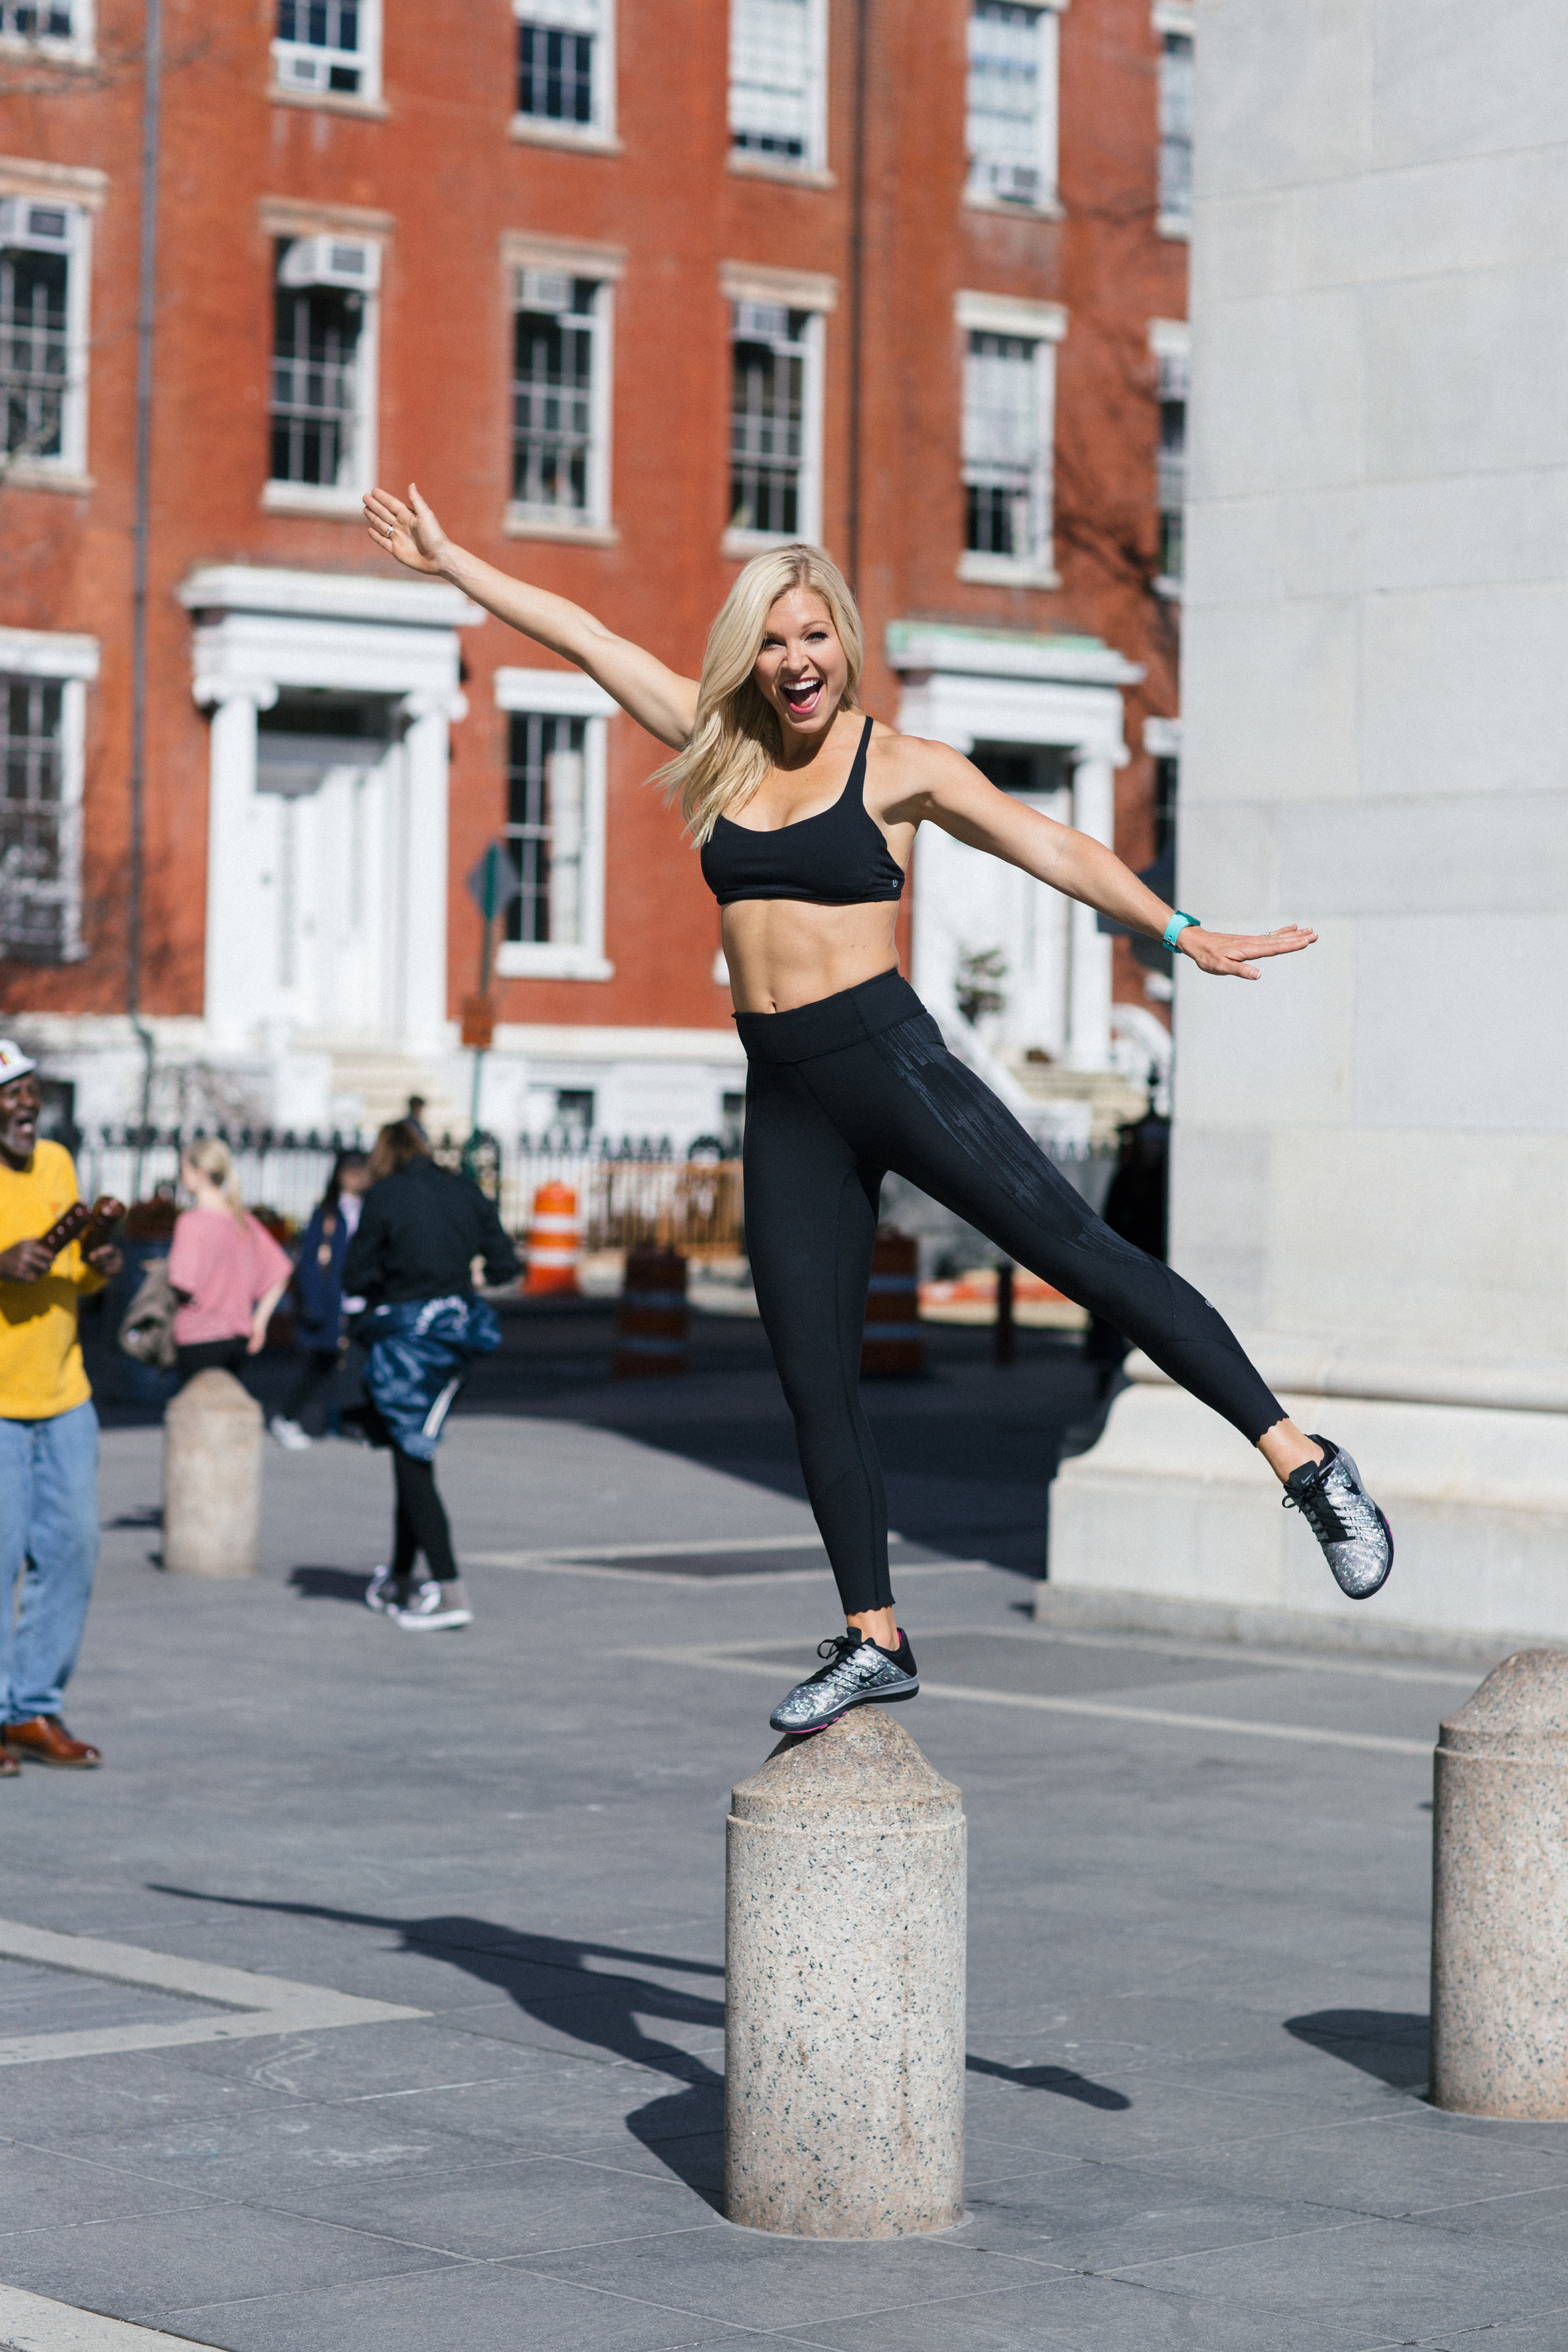 Anna Kooiman New York City Washington Square Park fitness travel lifestyle fashion television entertainment adventure fun annakooiman.com